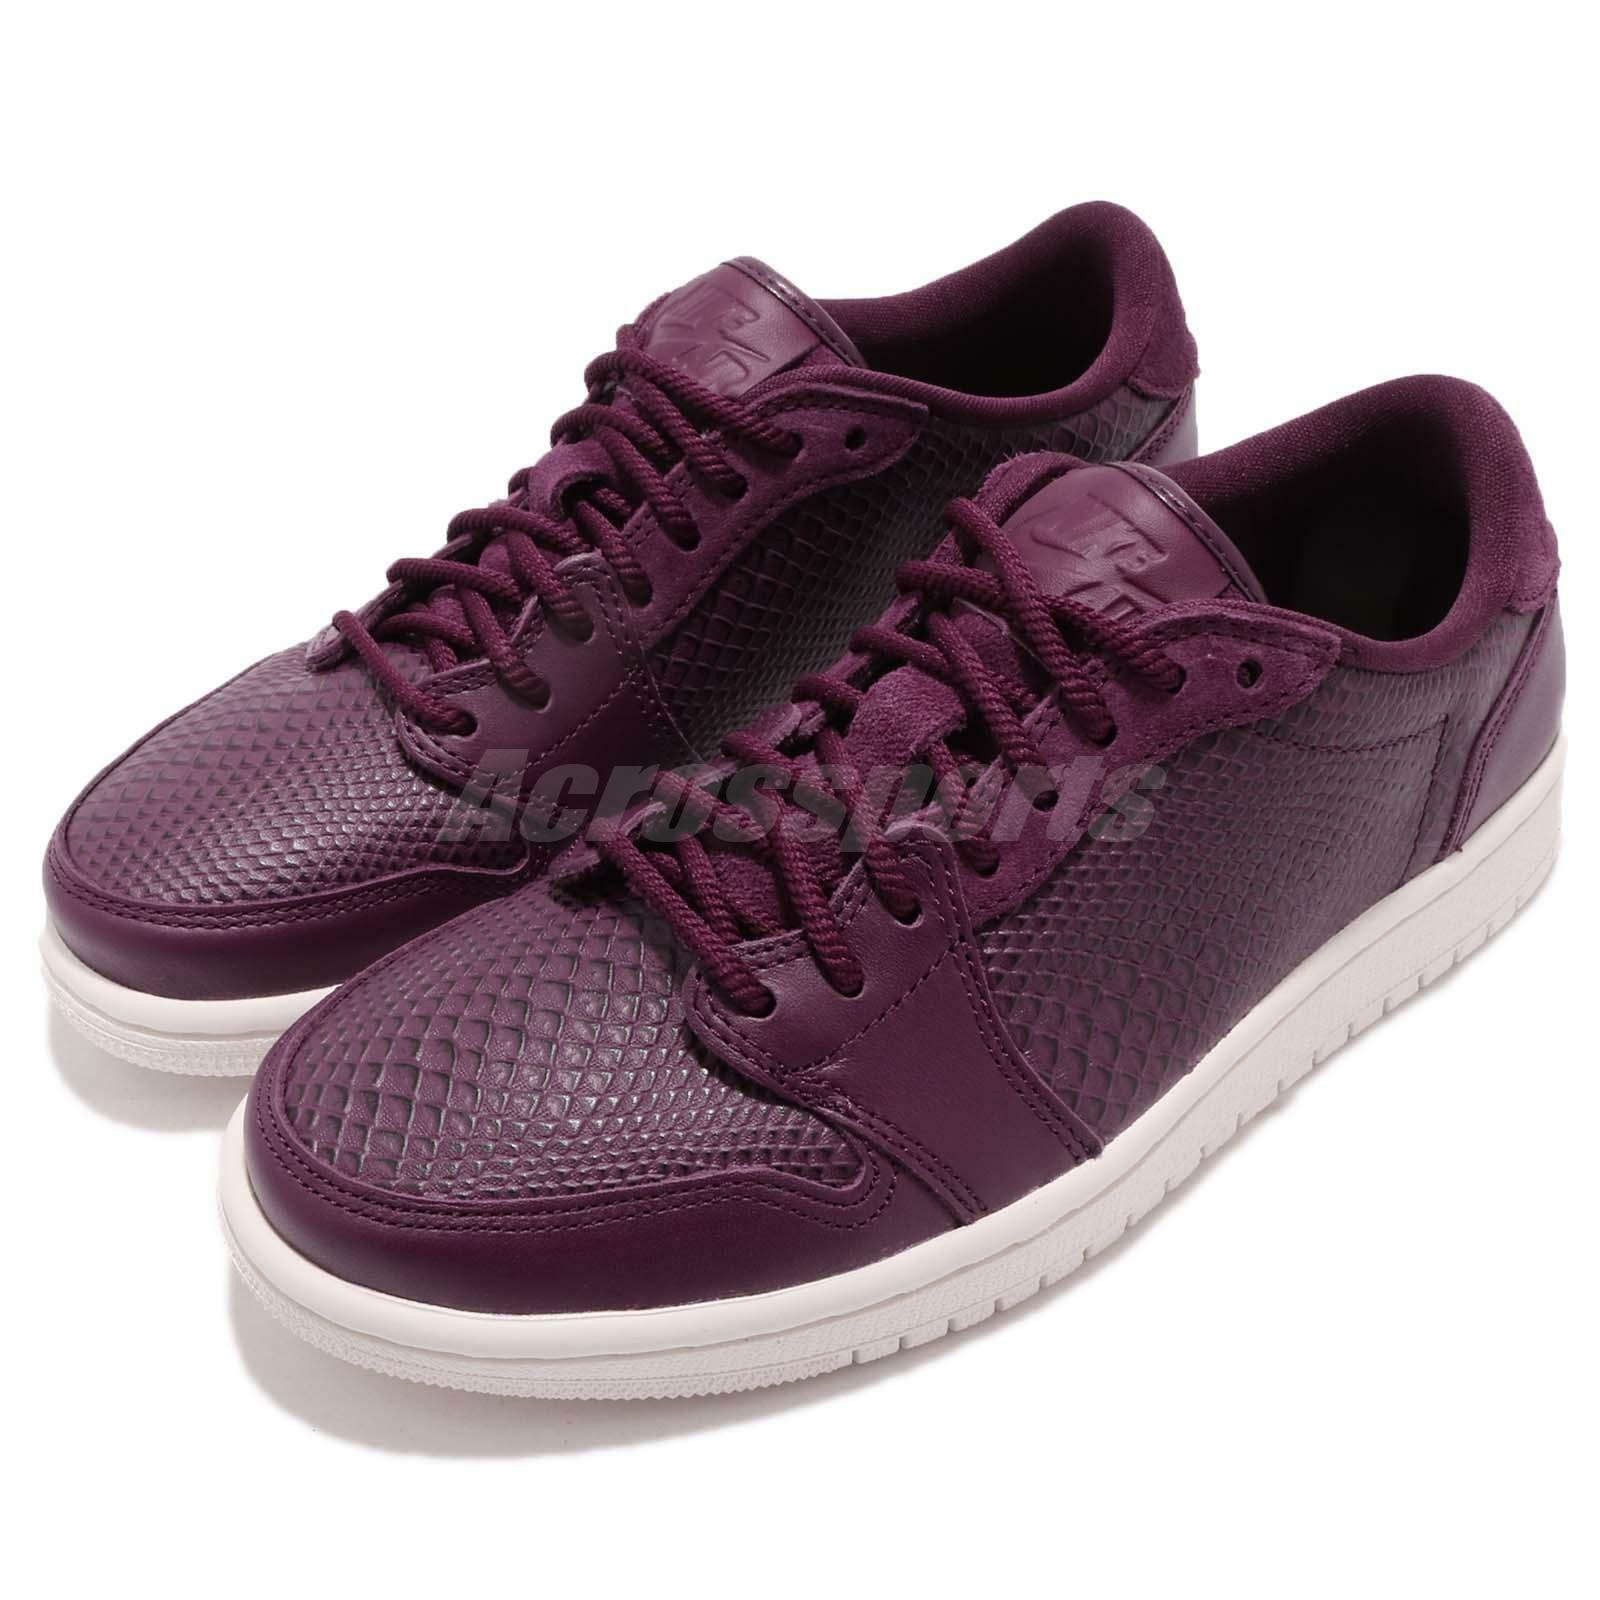 Nike Wmns Air Jordan 1 Retro Low Phantom NS AJ1 Bordeaux Violet Phantom Low femmes AO1935-600 110083